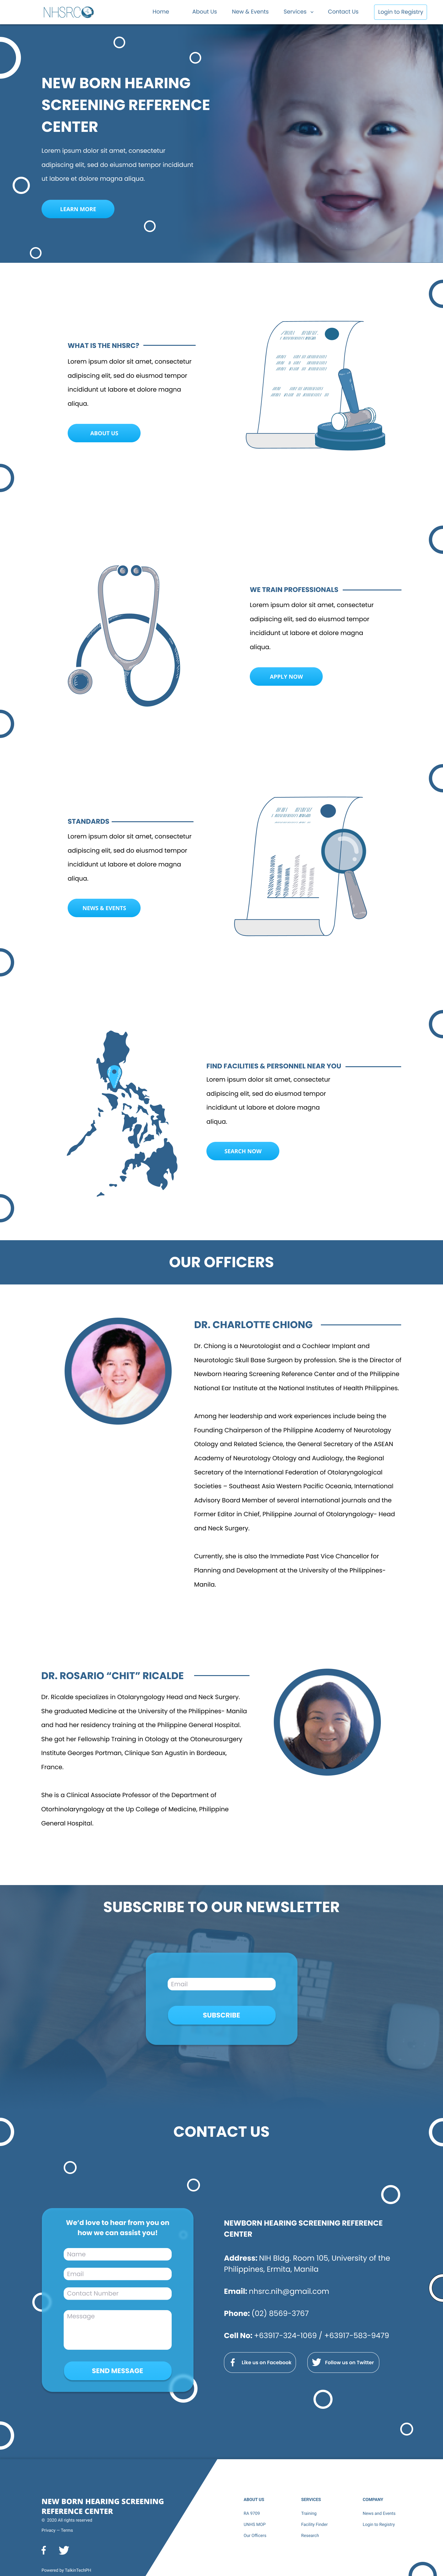 NHSRC web design